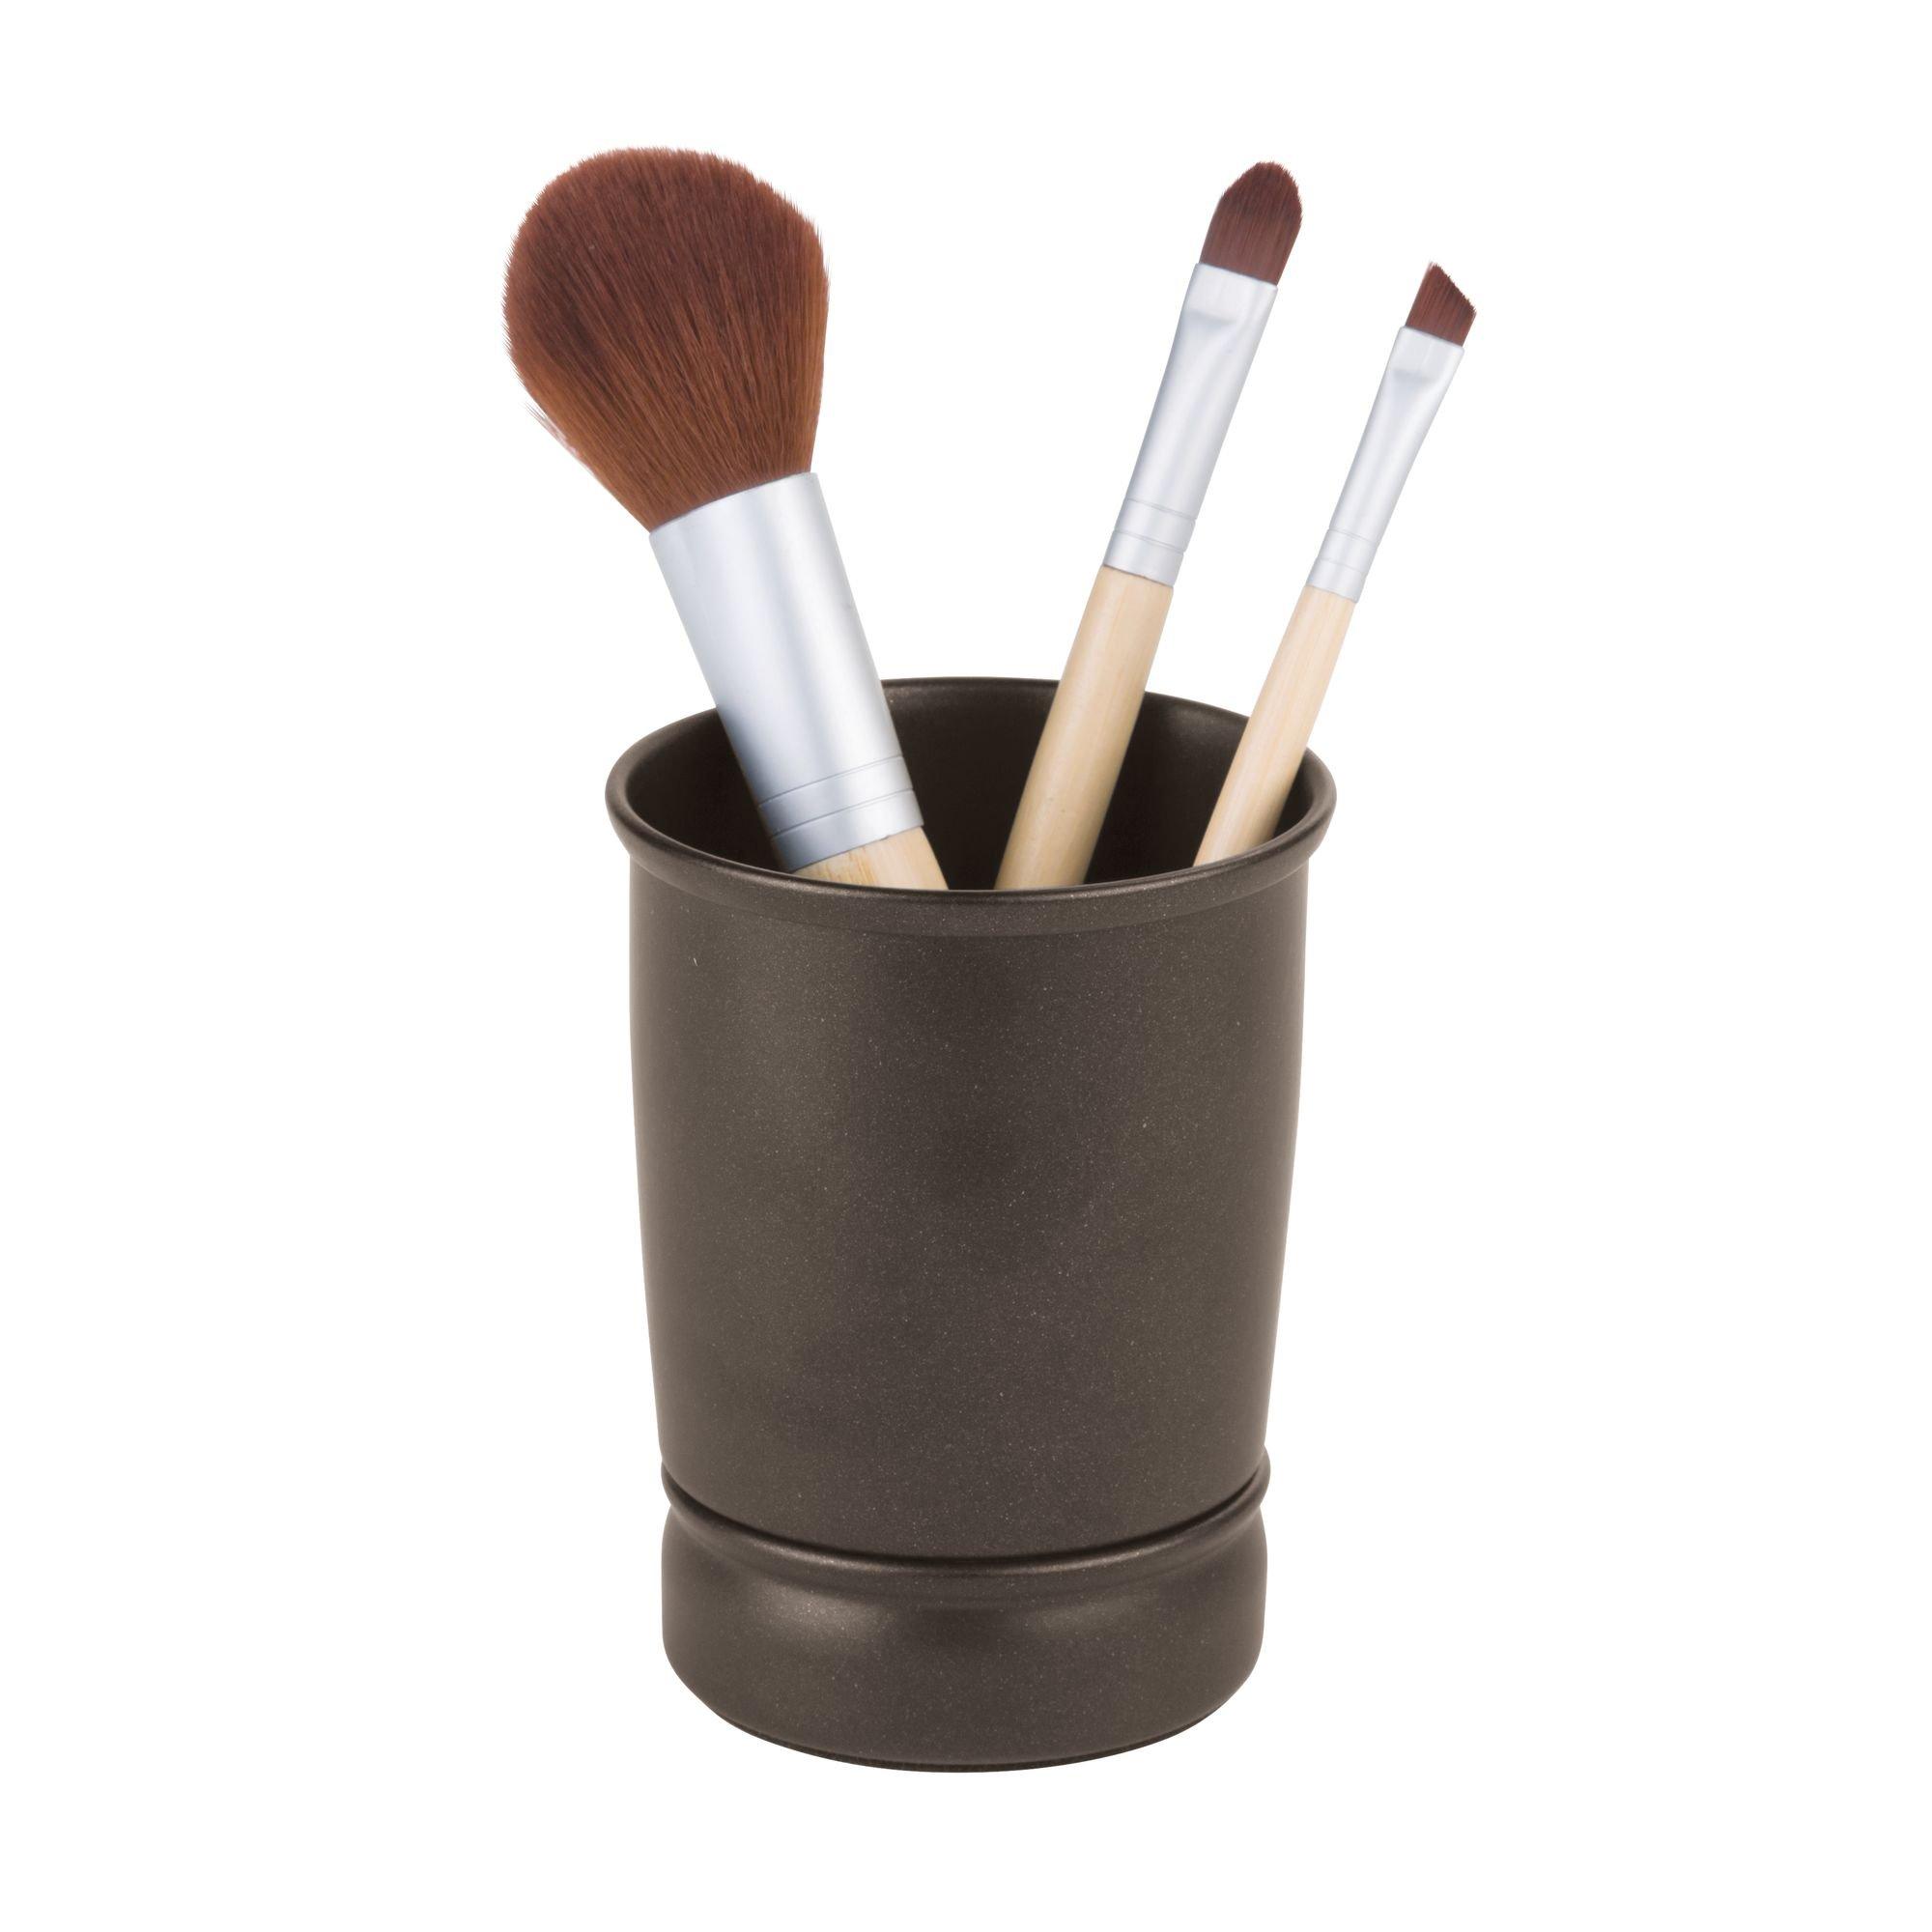 iDesign York Metal Tumbler, Makeup Brush Toothbrush Holder for Bathroom, Countertop, Desk, Dorm, College, and Vanity, 3.25'' x 3.25'' x 4.25'', Bronze by iDesign